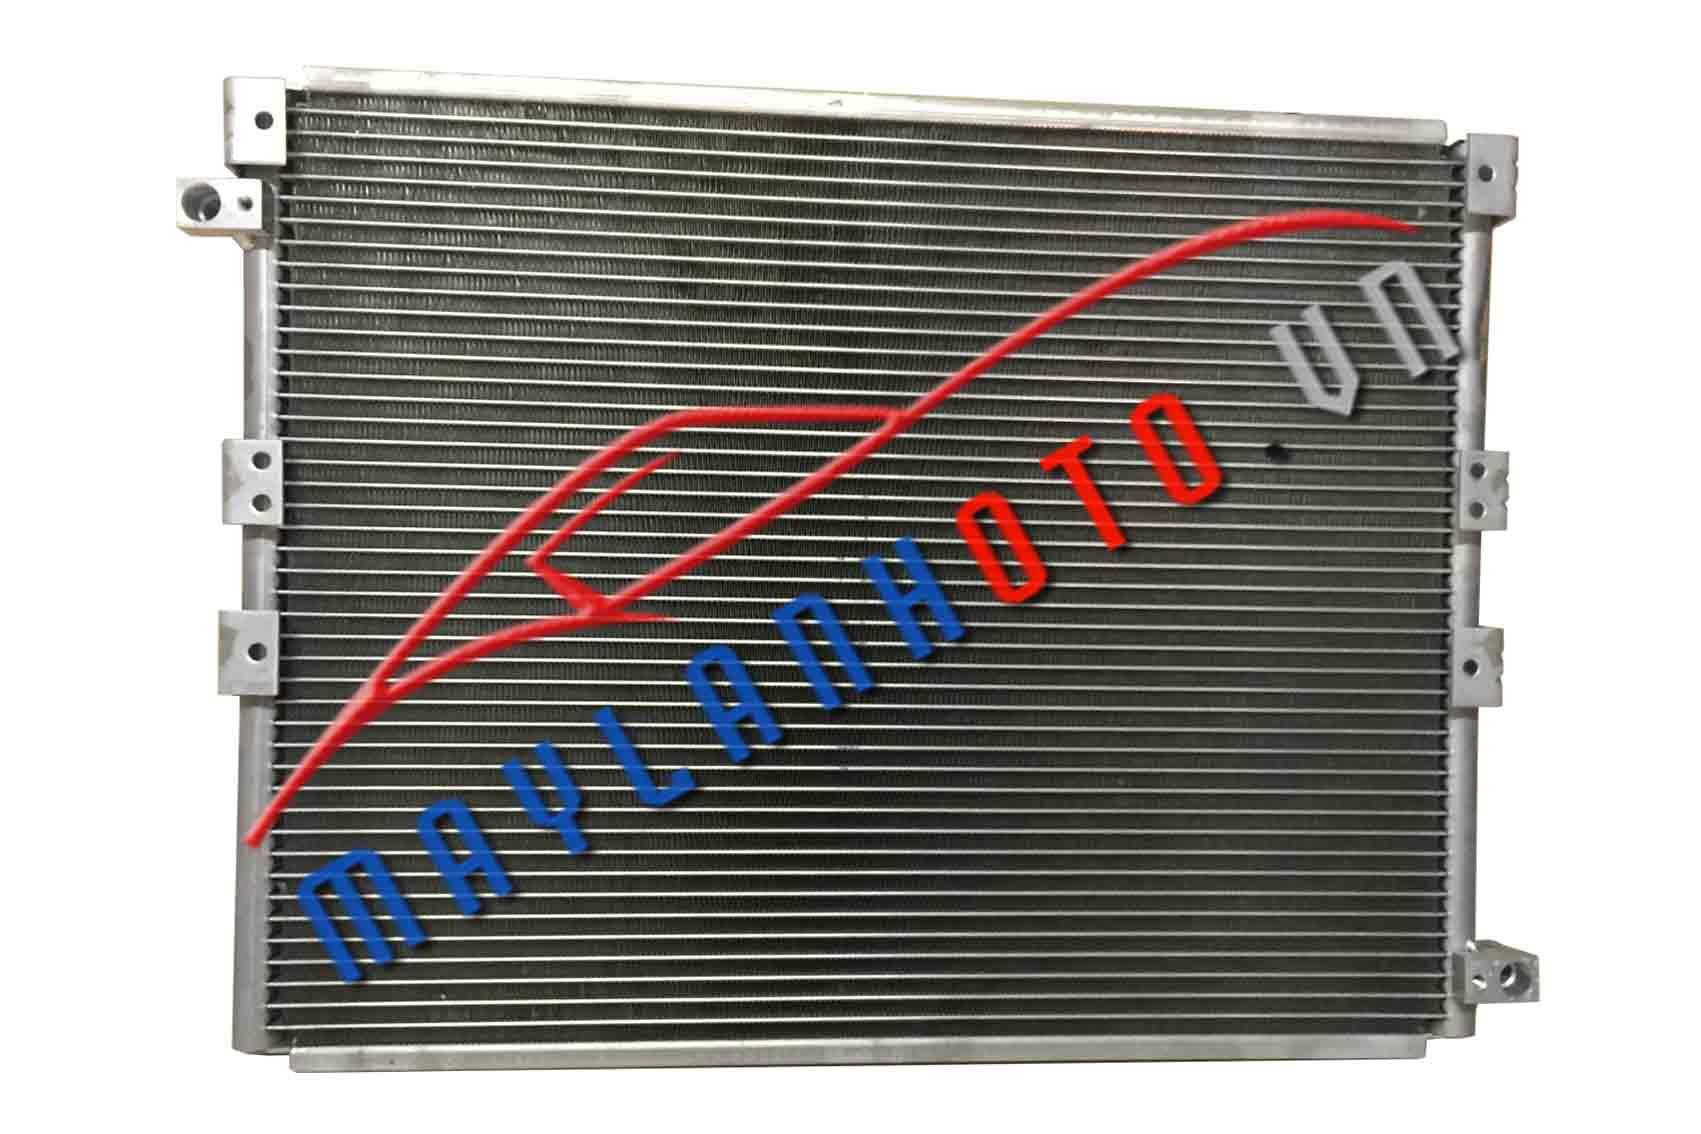 LandCruiser Prado 2000 / Giàn nóng điều hòa Toyota LandCruiser 2000/ Dàn nóng điều hòa Toyota LandCruiser 2000